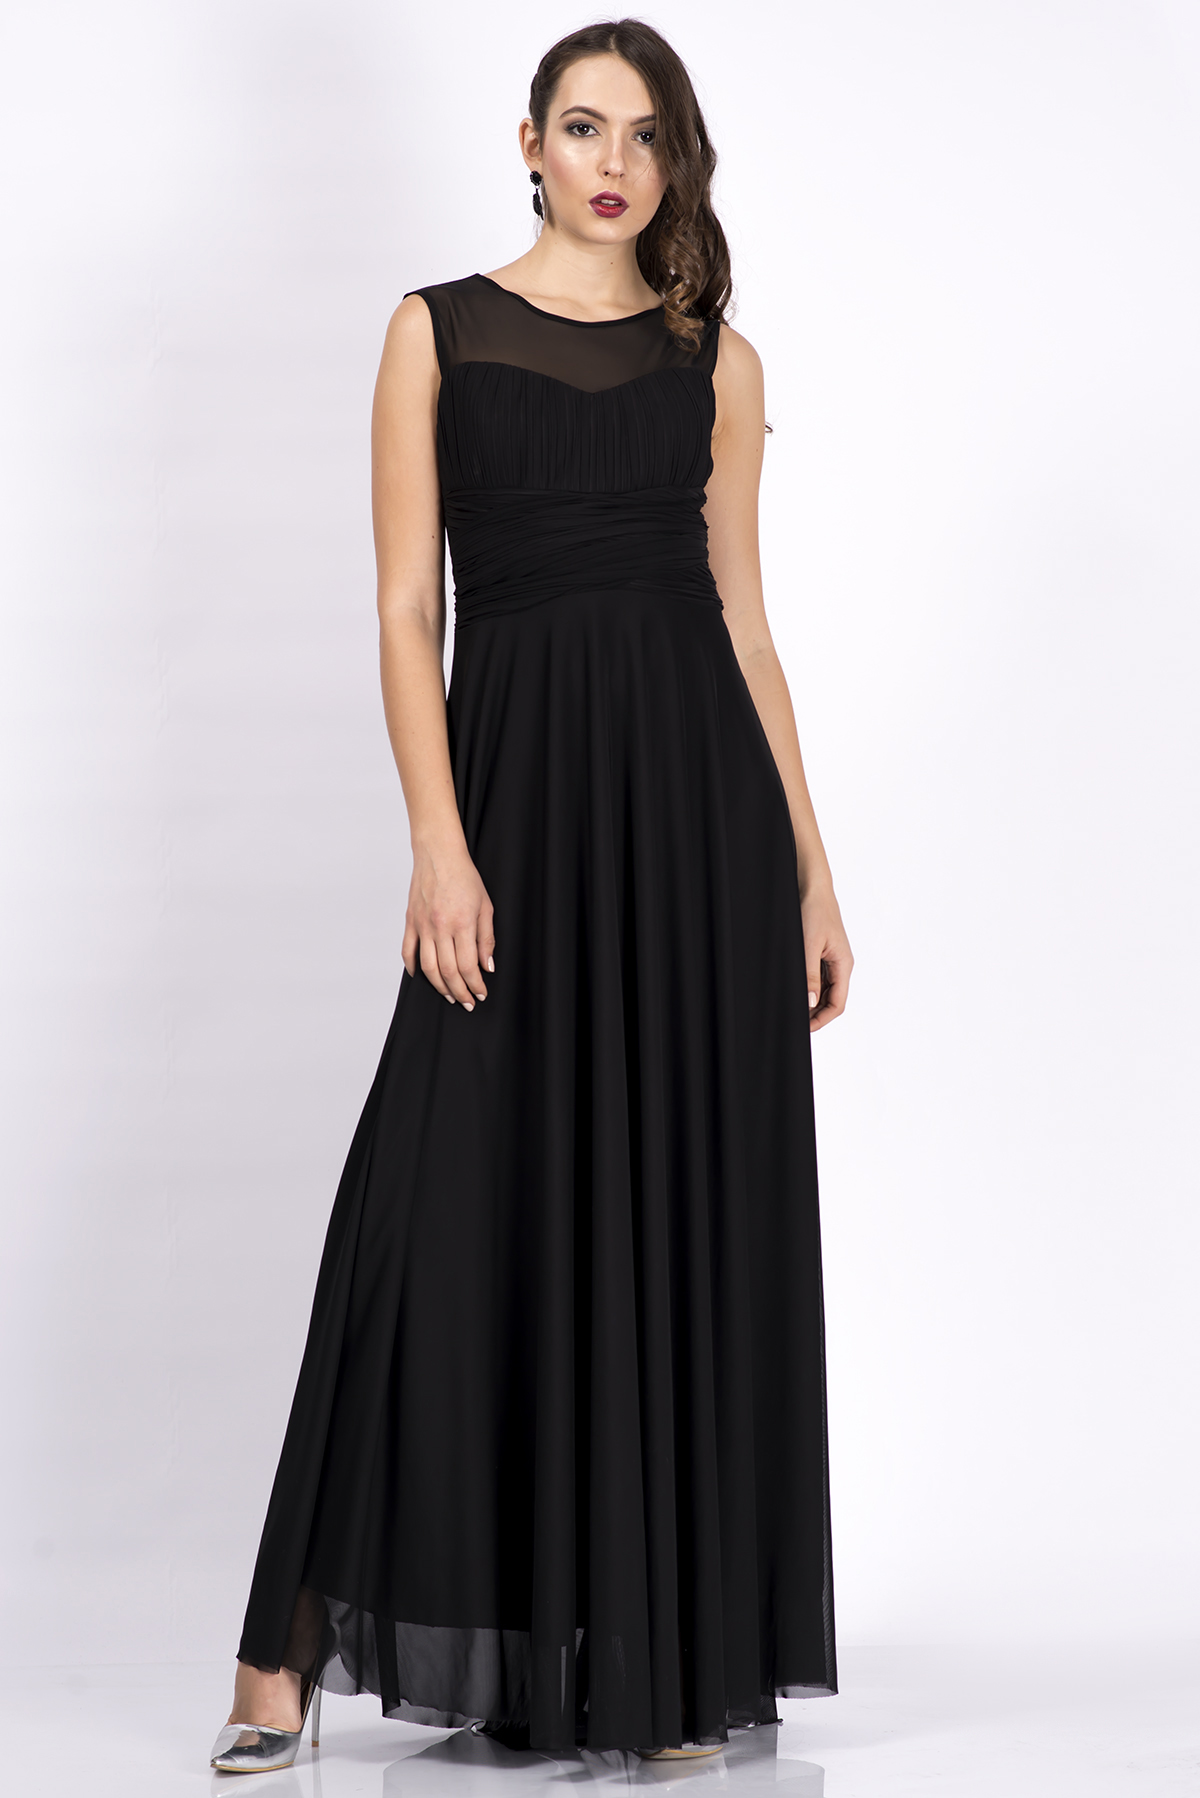 بالصور موديلات فساتين جديده , اشيك فستان جميل 336 15